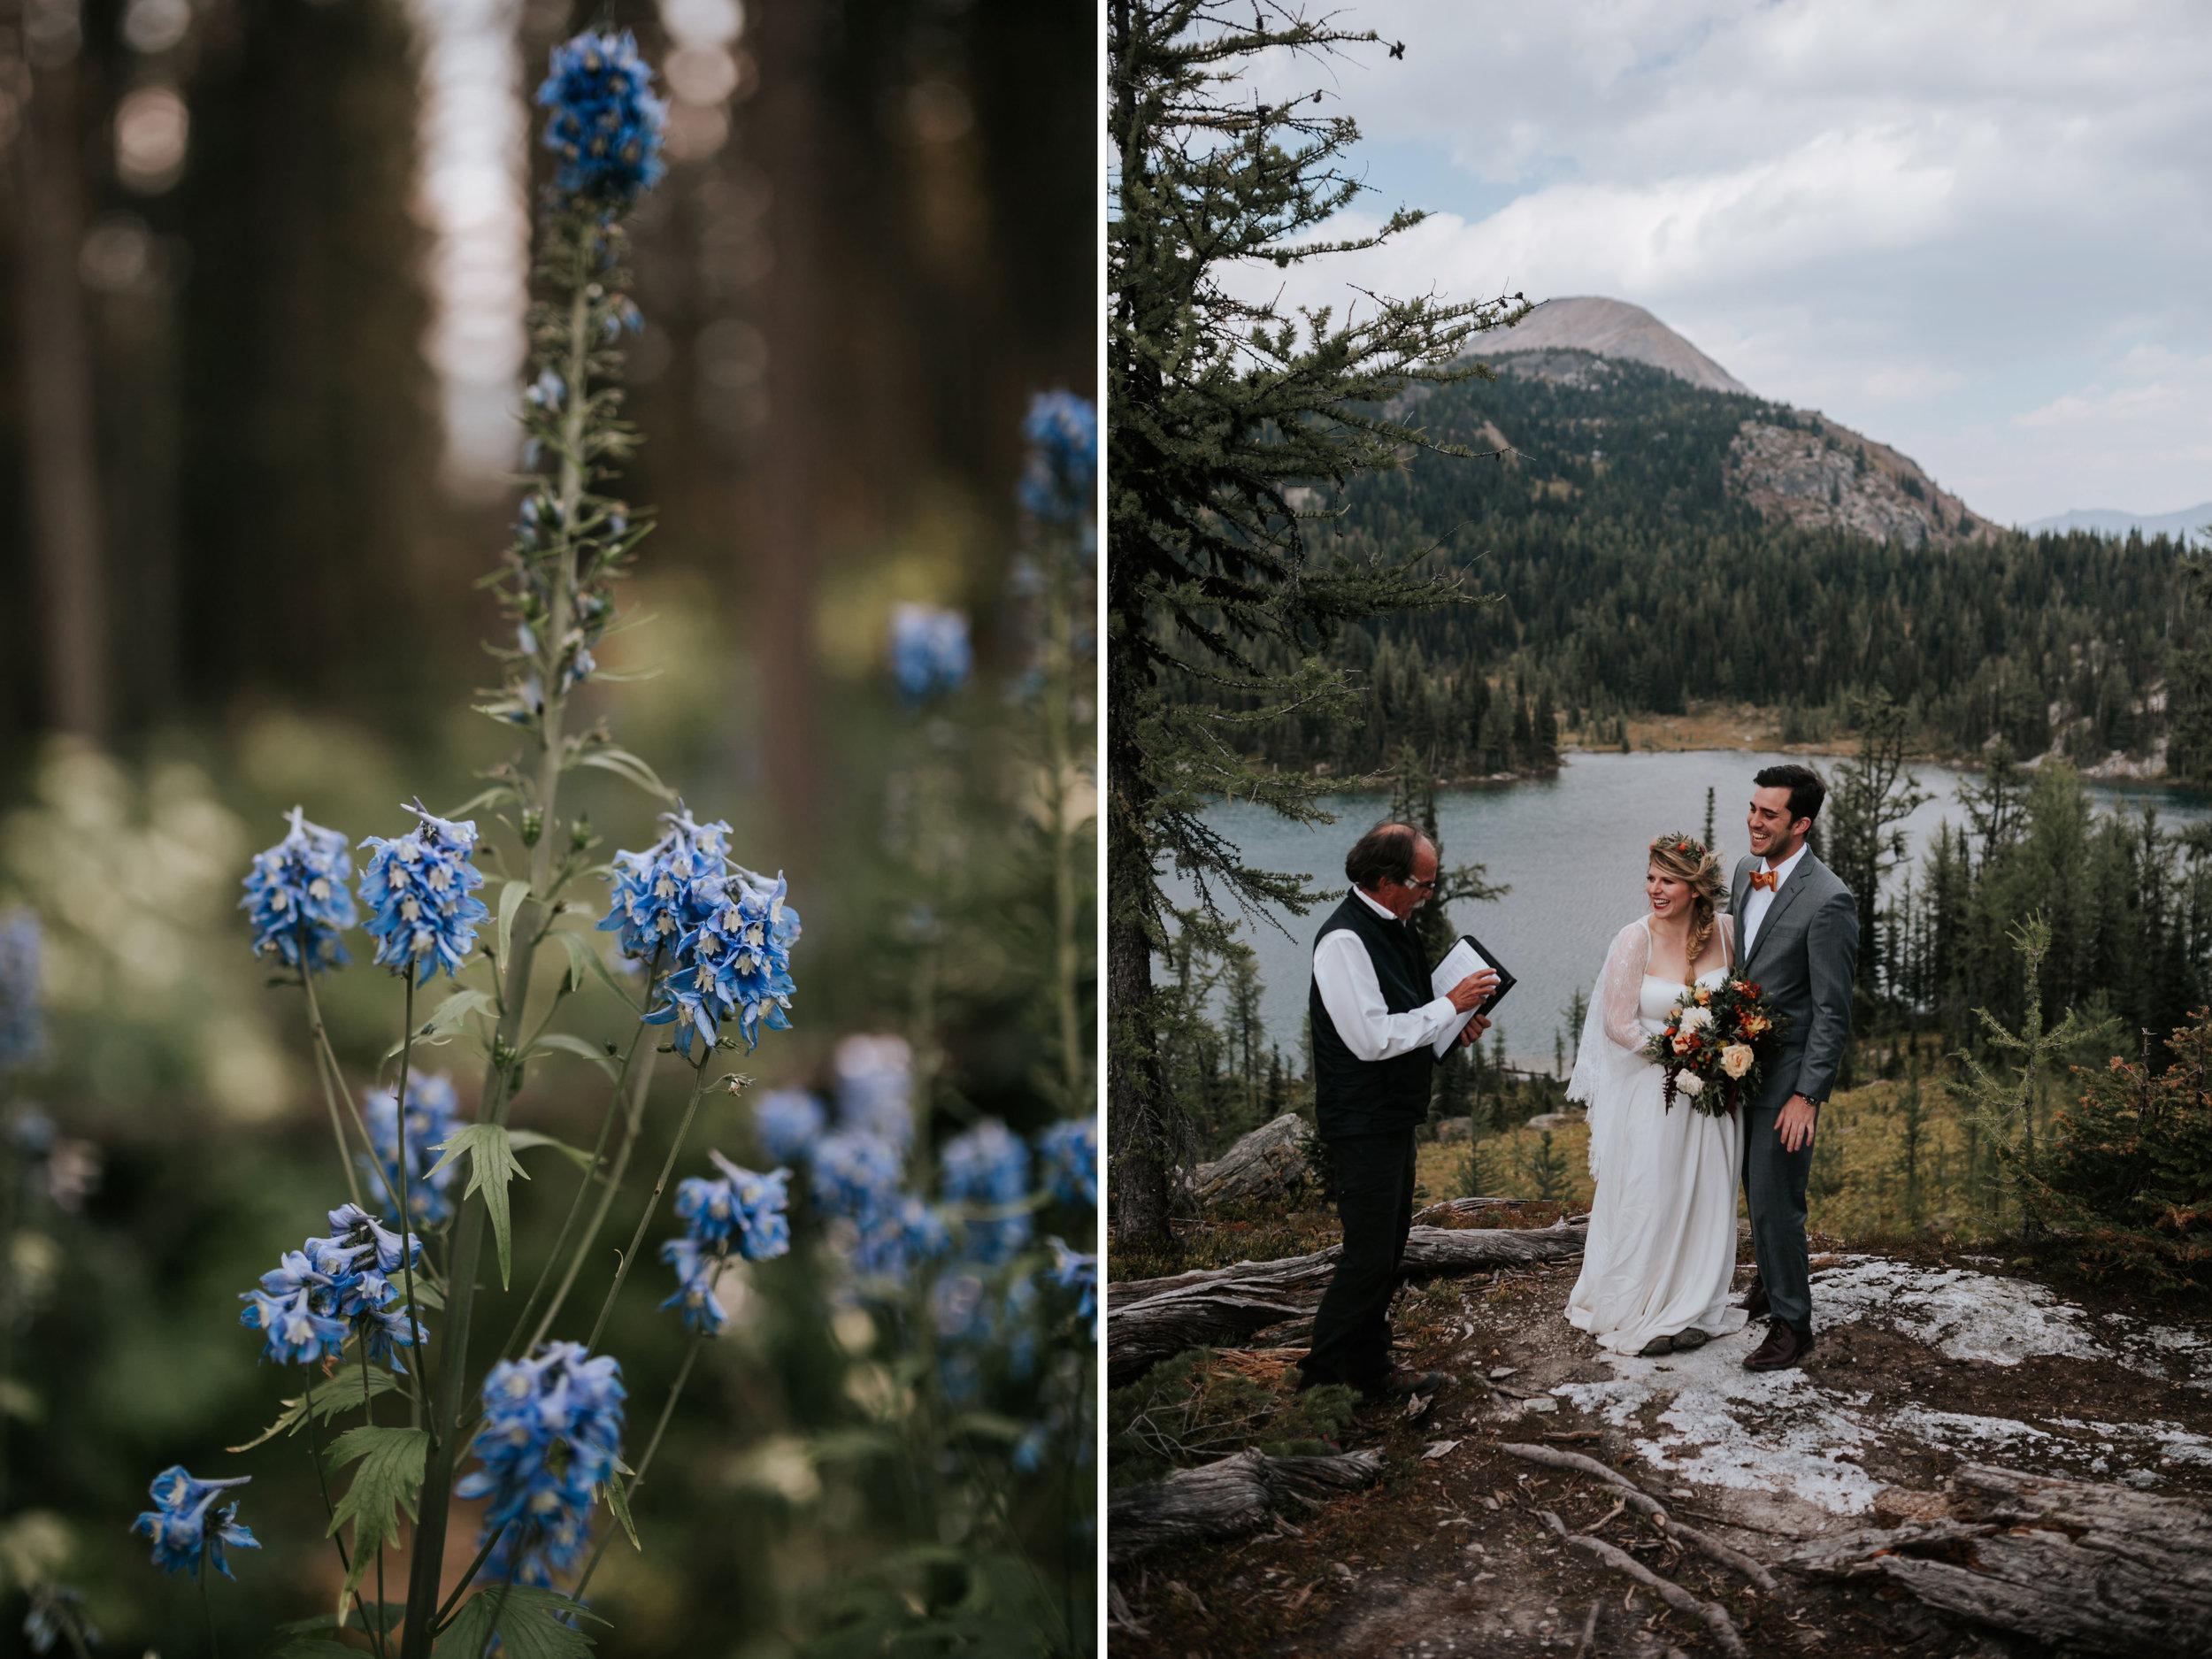 Banff National Park, Alberta Canada Elopement - Grace and Jaden Photography (10).jpg